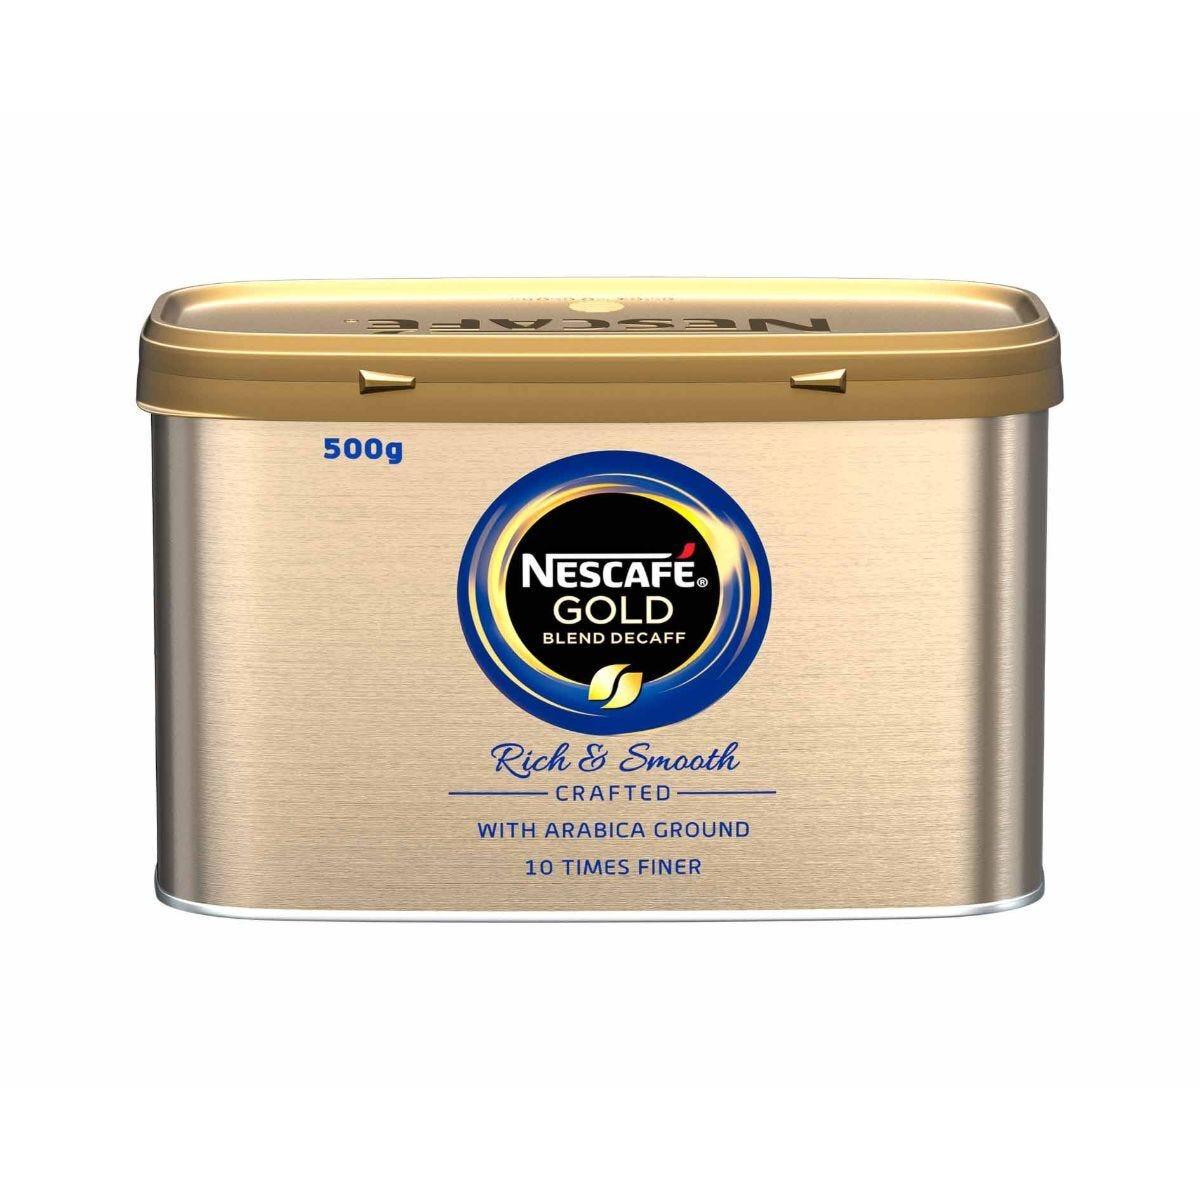 Nescafe Gold Blend Coffee Decaffeinated 500g